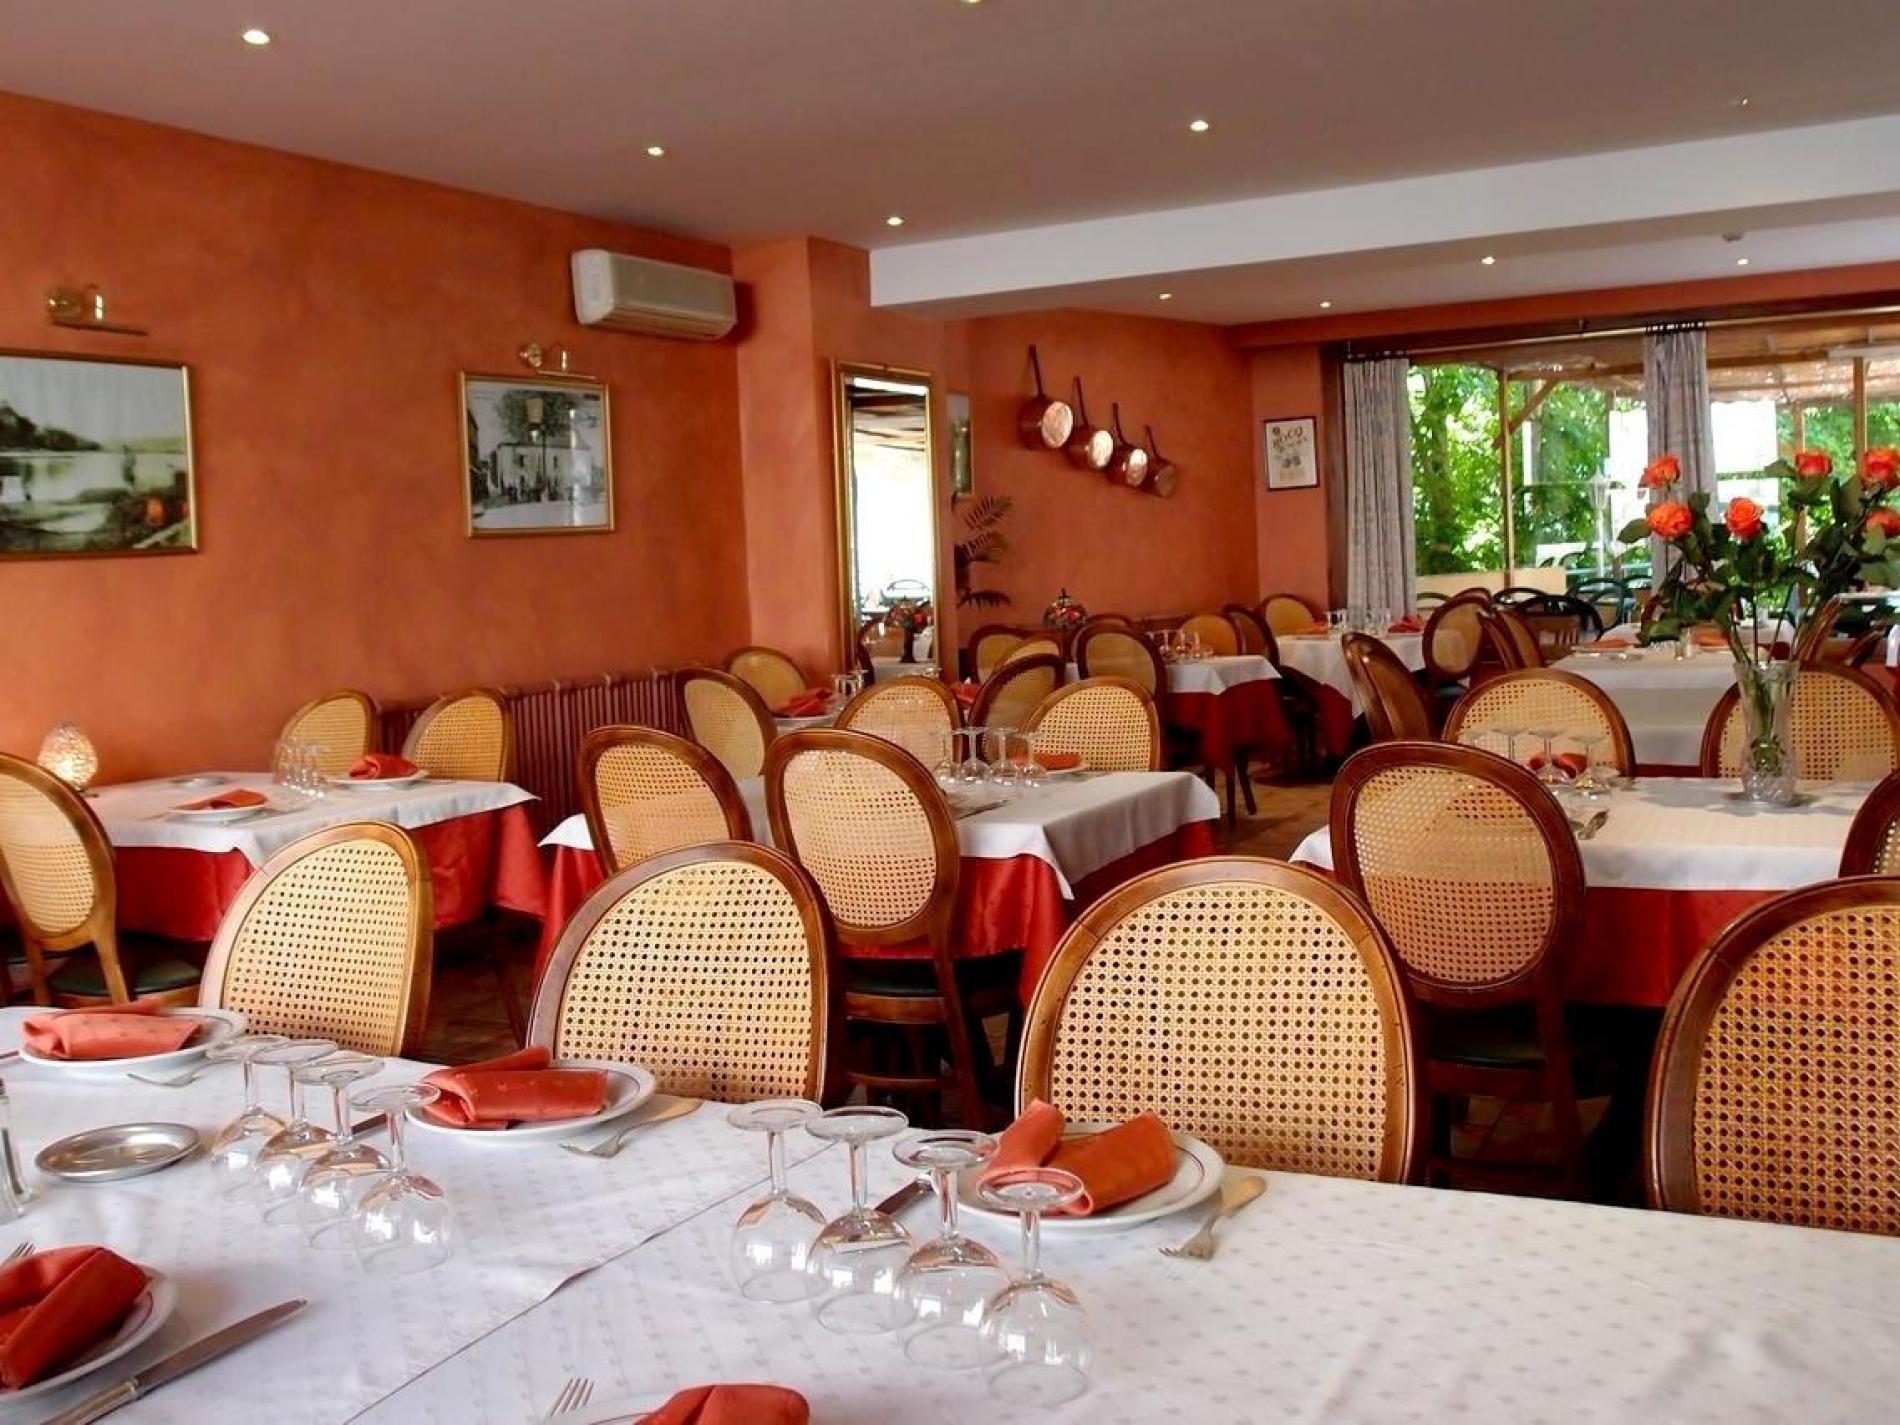 Hôtel Restaurant Les Ambassadeurs